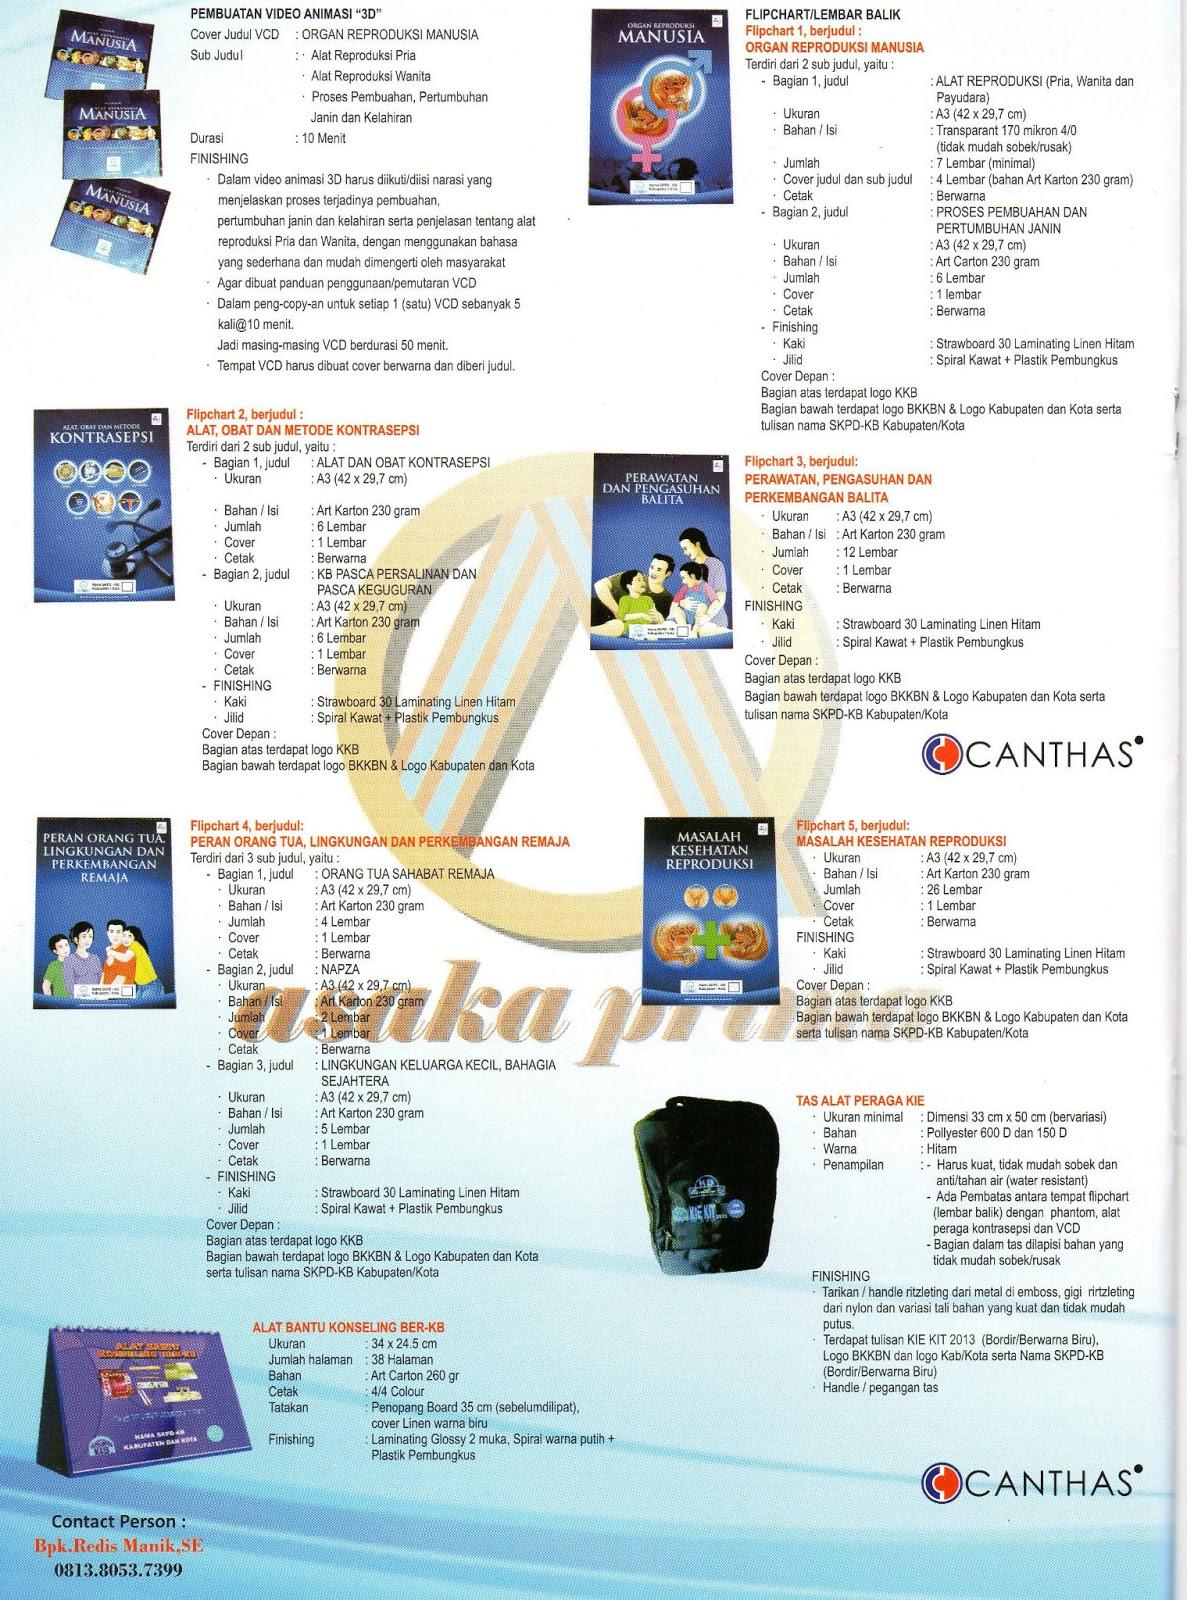 KIE Kit, kie kit dakbkkbn, DAK BKKBN 2013, Phantom Alat Peraga, Konseling KB, Keluarga Berencana, Alkes,